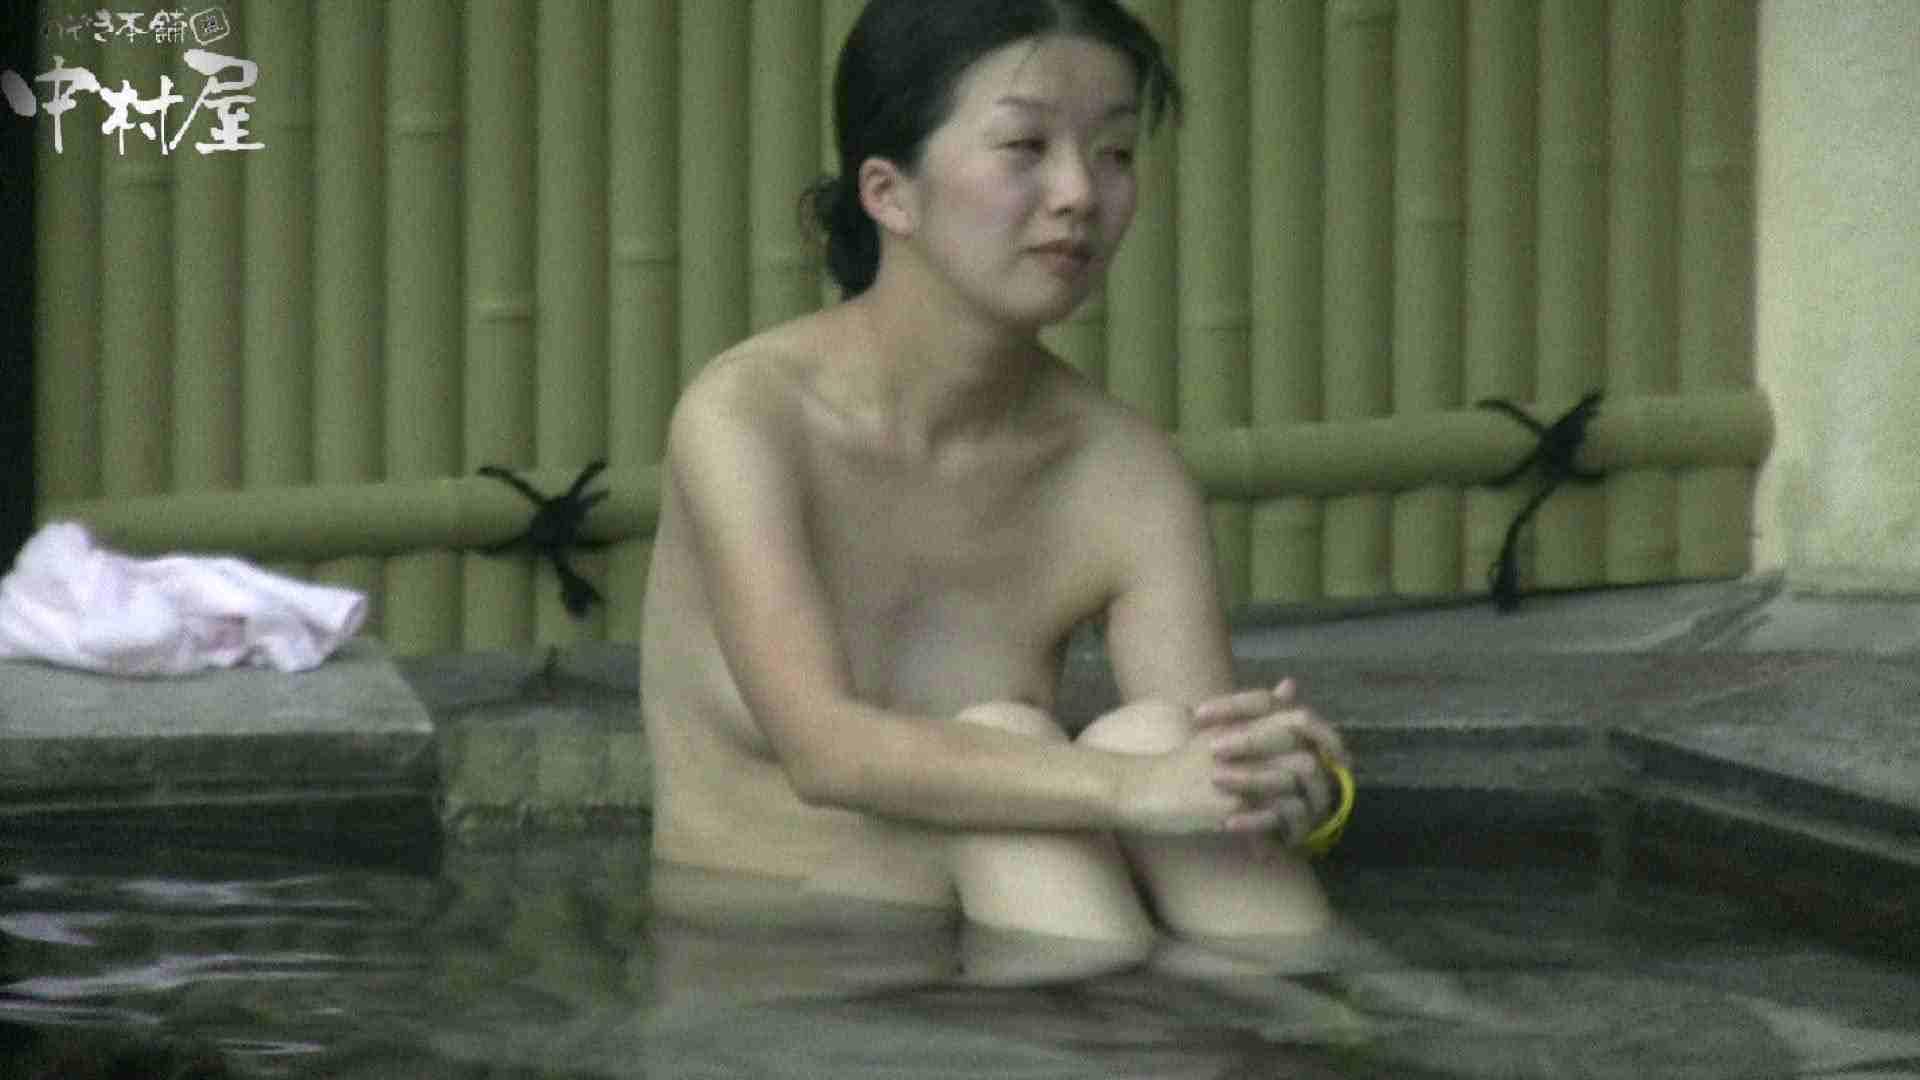 Aquaな露天風呂Vol.904 盗撮師作品 | 露天風呂突入  103pic 79